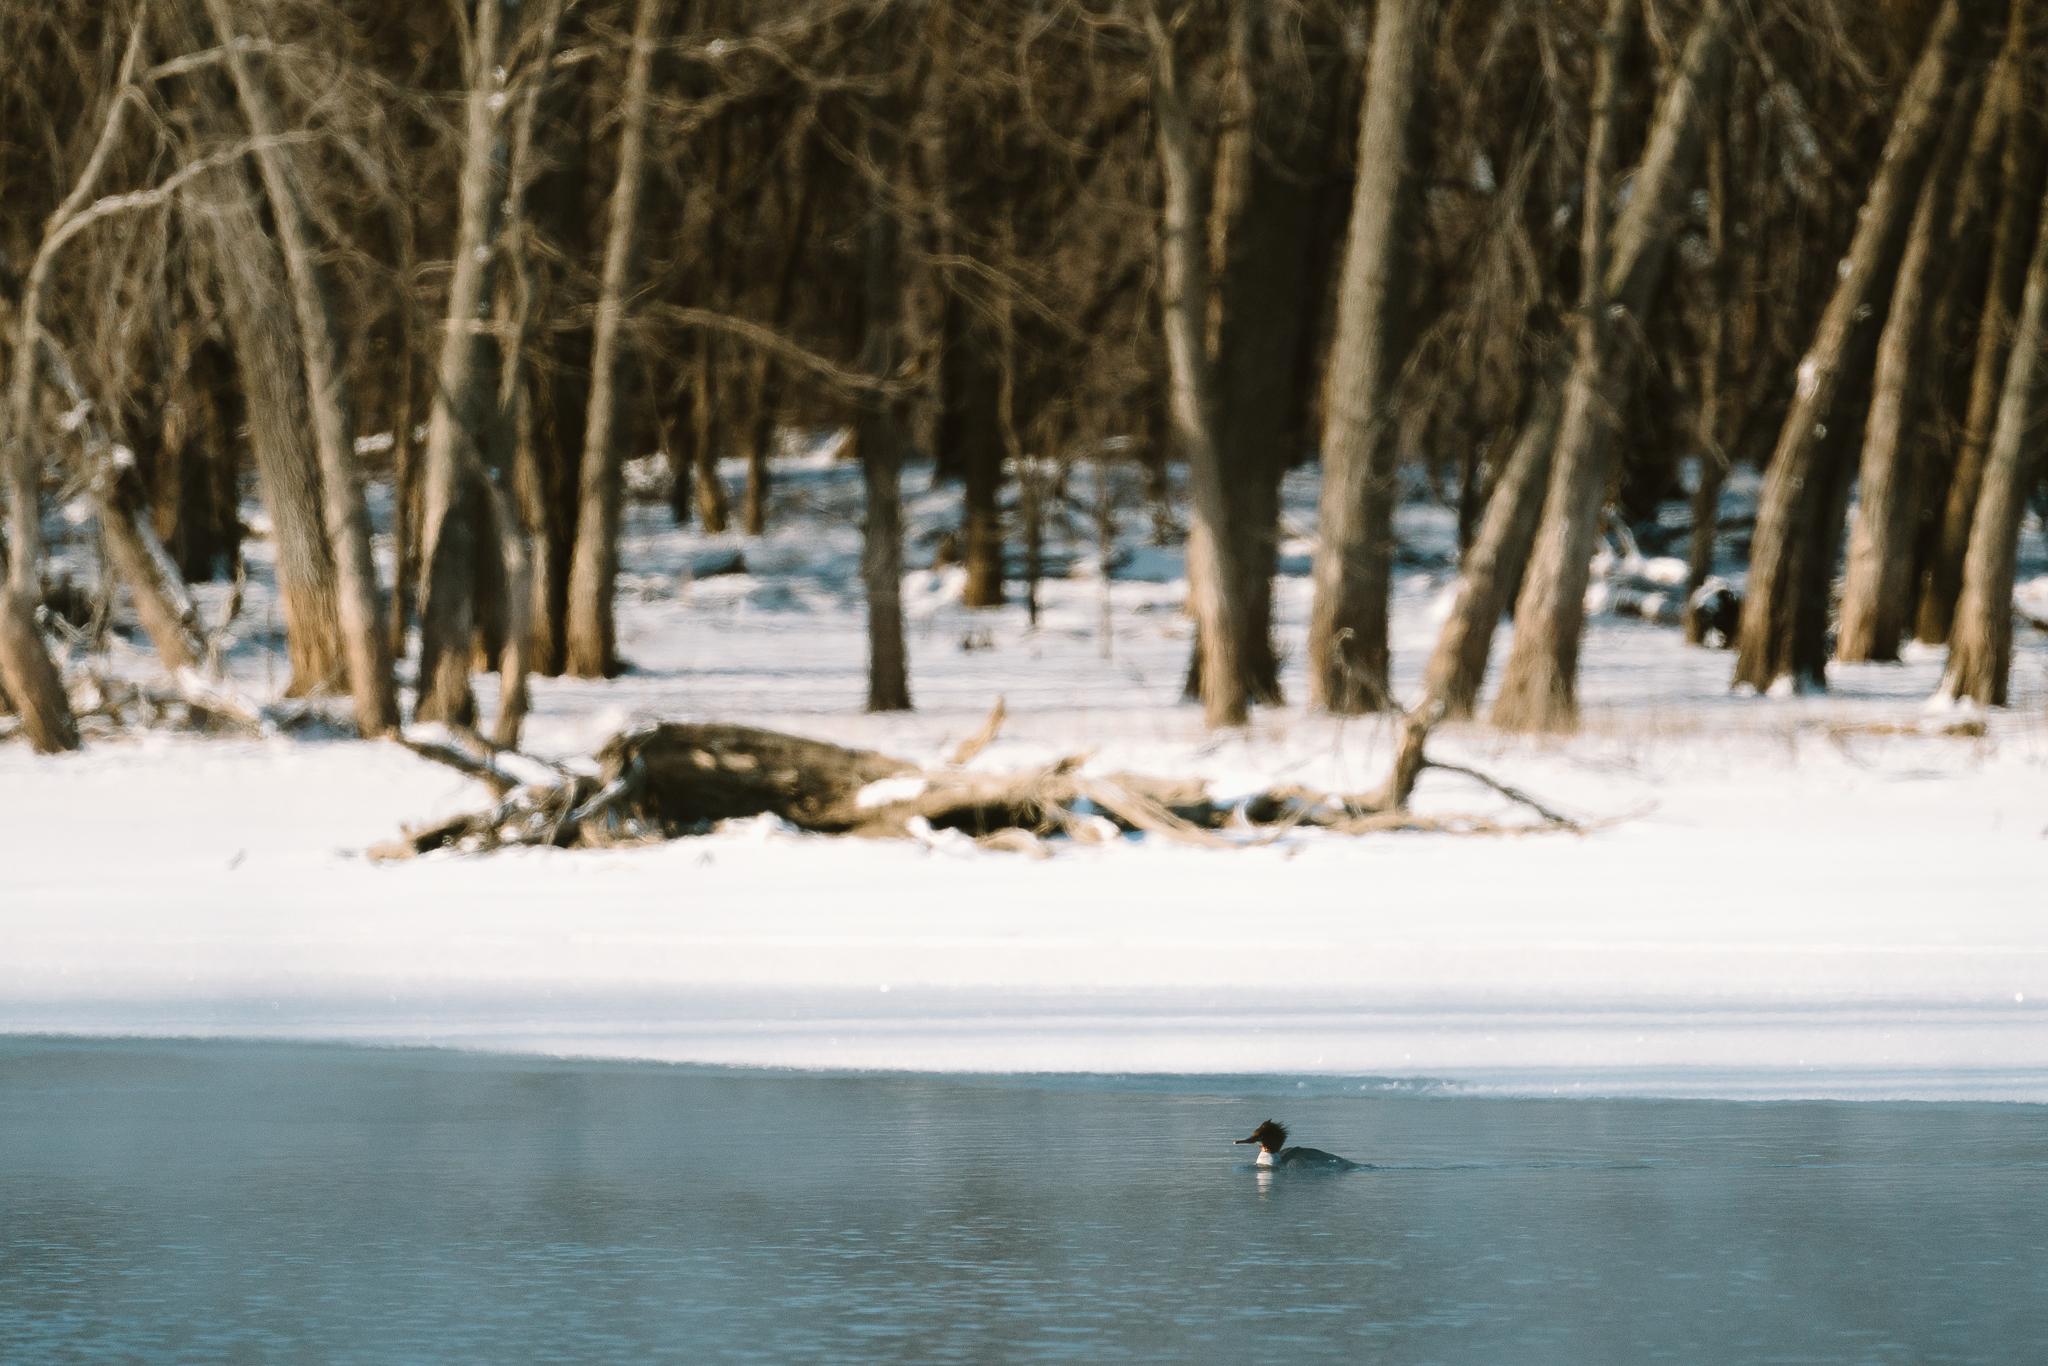 Common Merganser Duck at Colvill Park in Red Wing, Minnesota